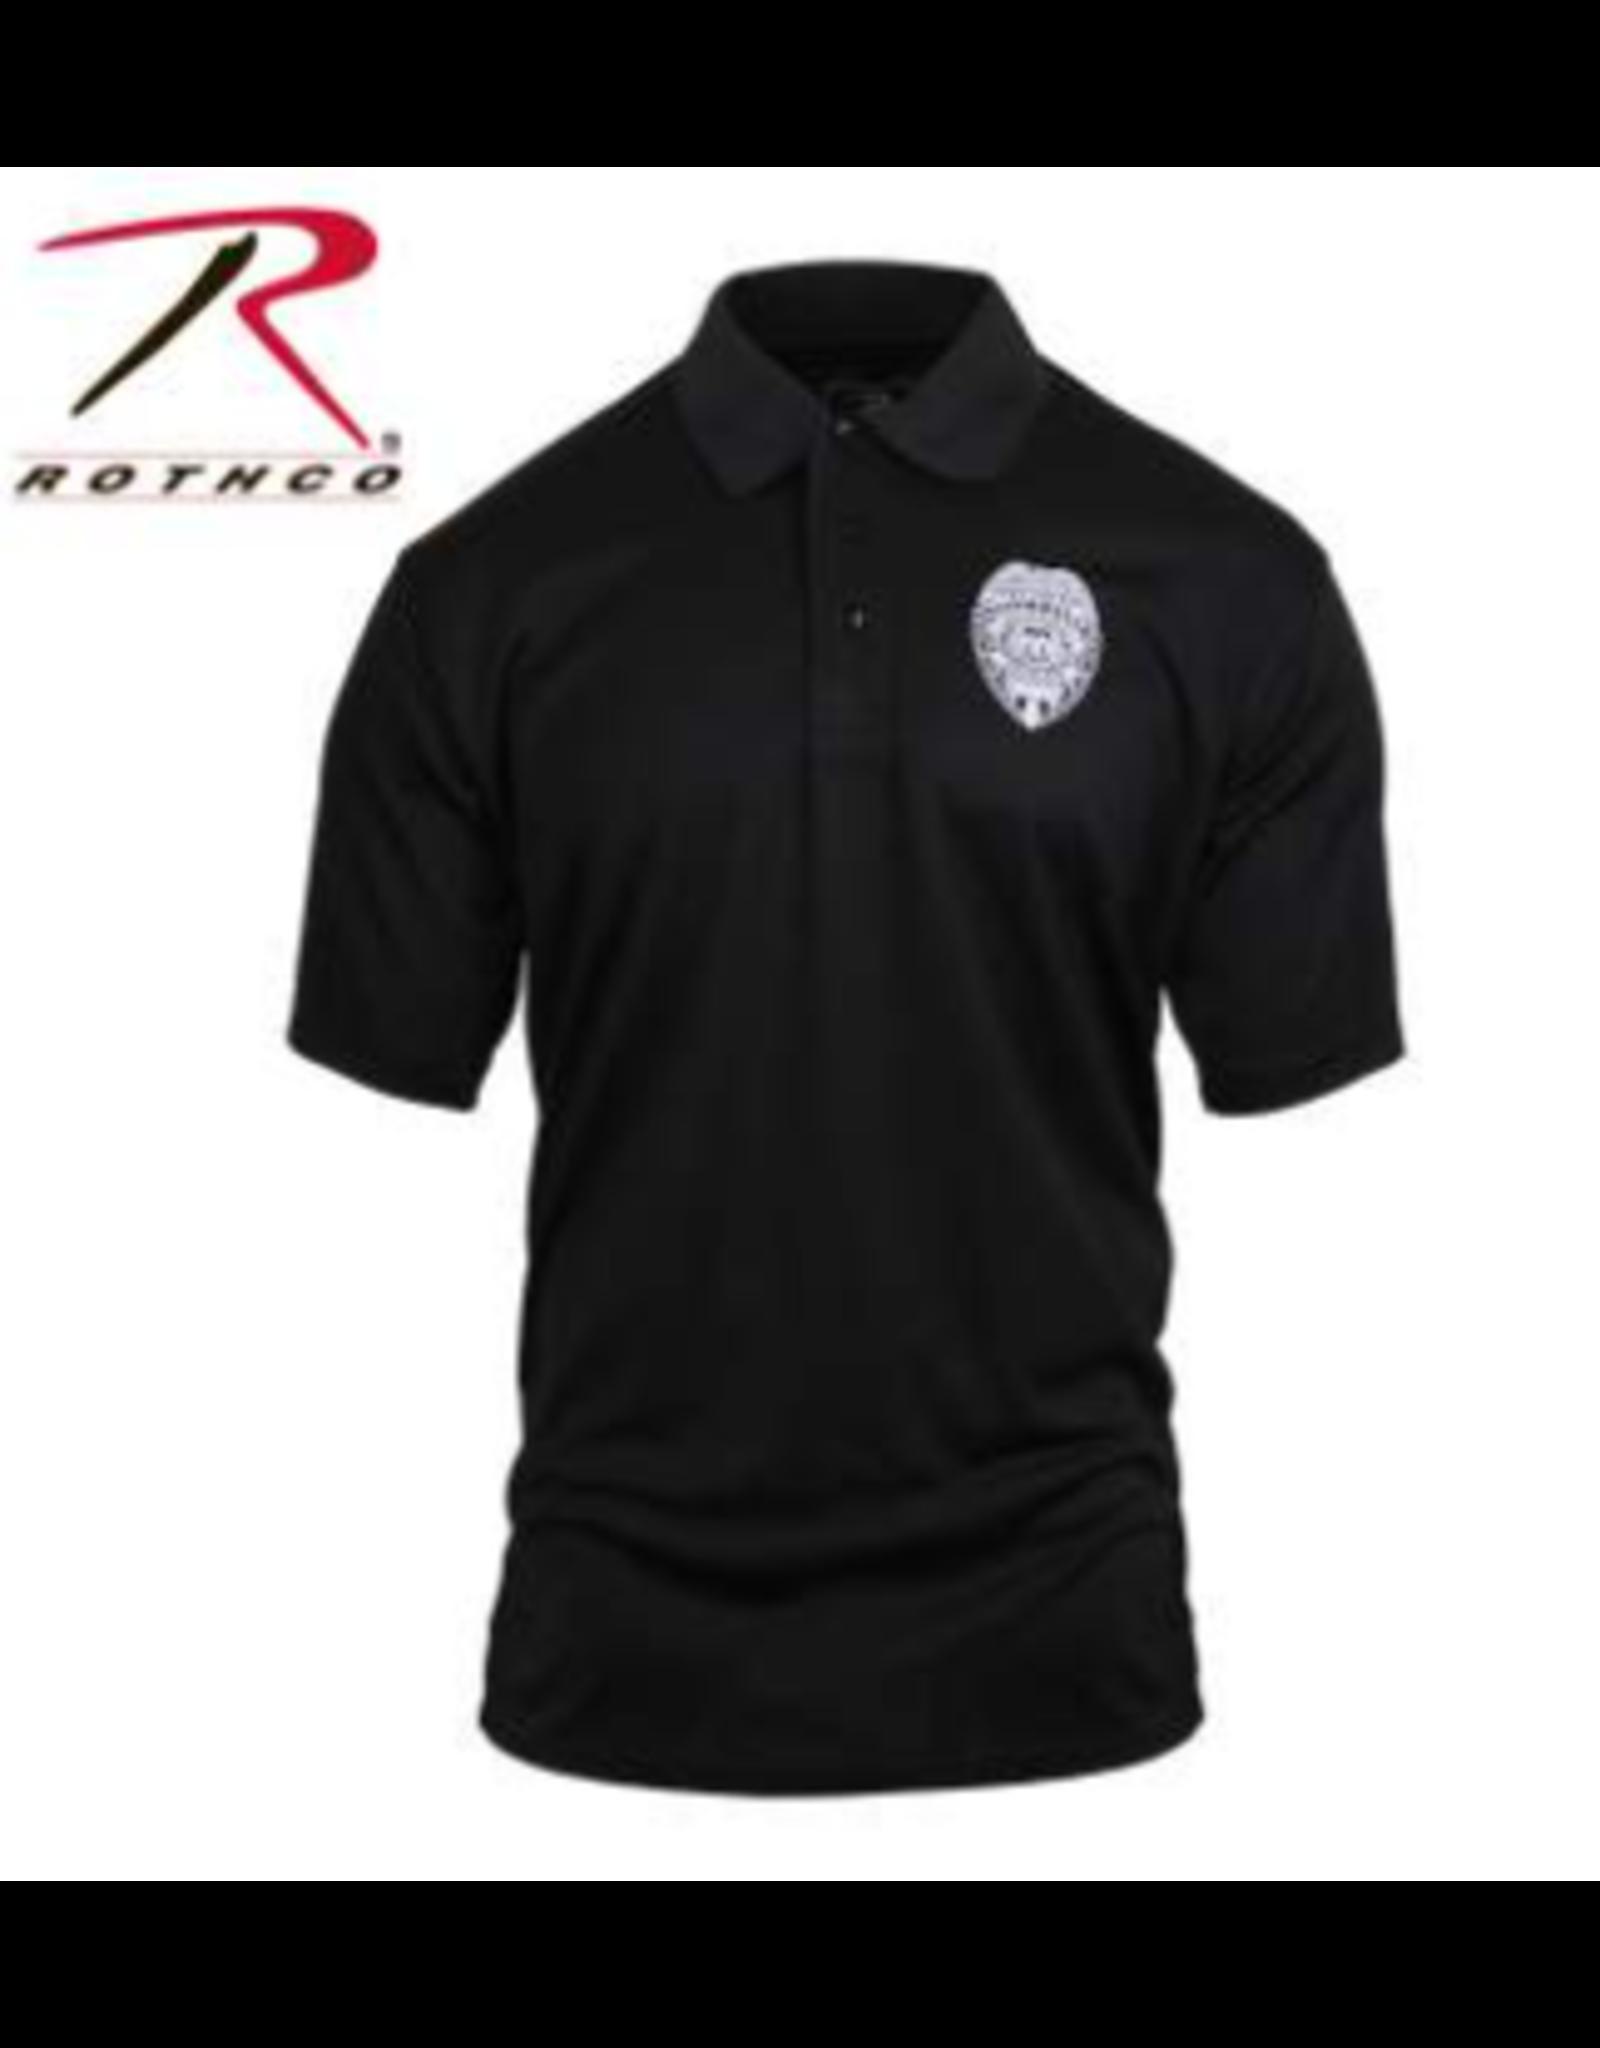 Rothco Rothco Moisture Wicking Polo Security Badge  2XL